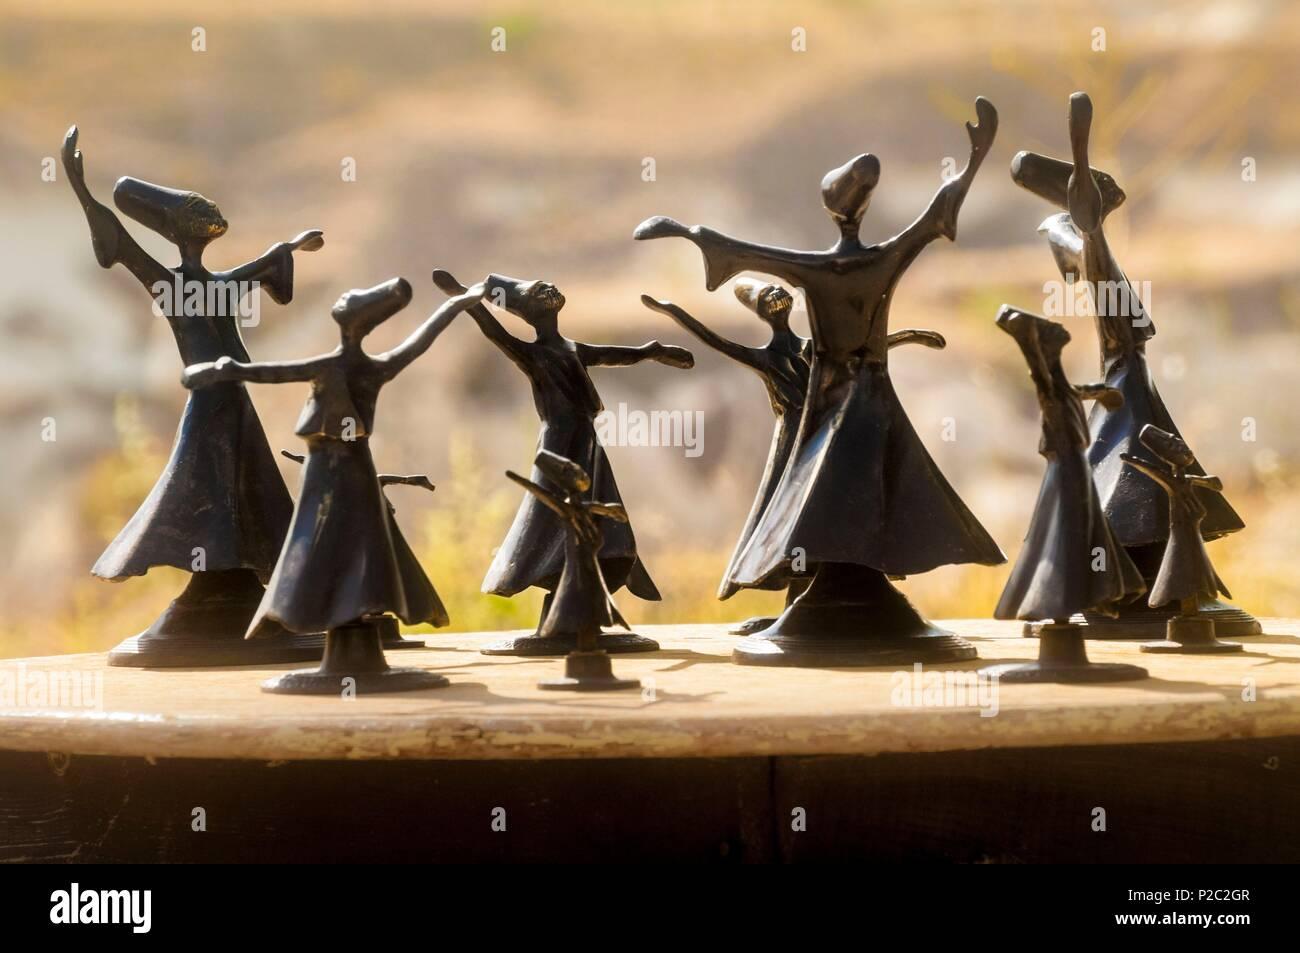 Turkey, Central Anatolia, Nevşehir province, Cappadocia UNESCO World Heritage Site, Göreme, statuettes of whirling dervishes - Stock Image